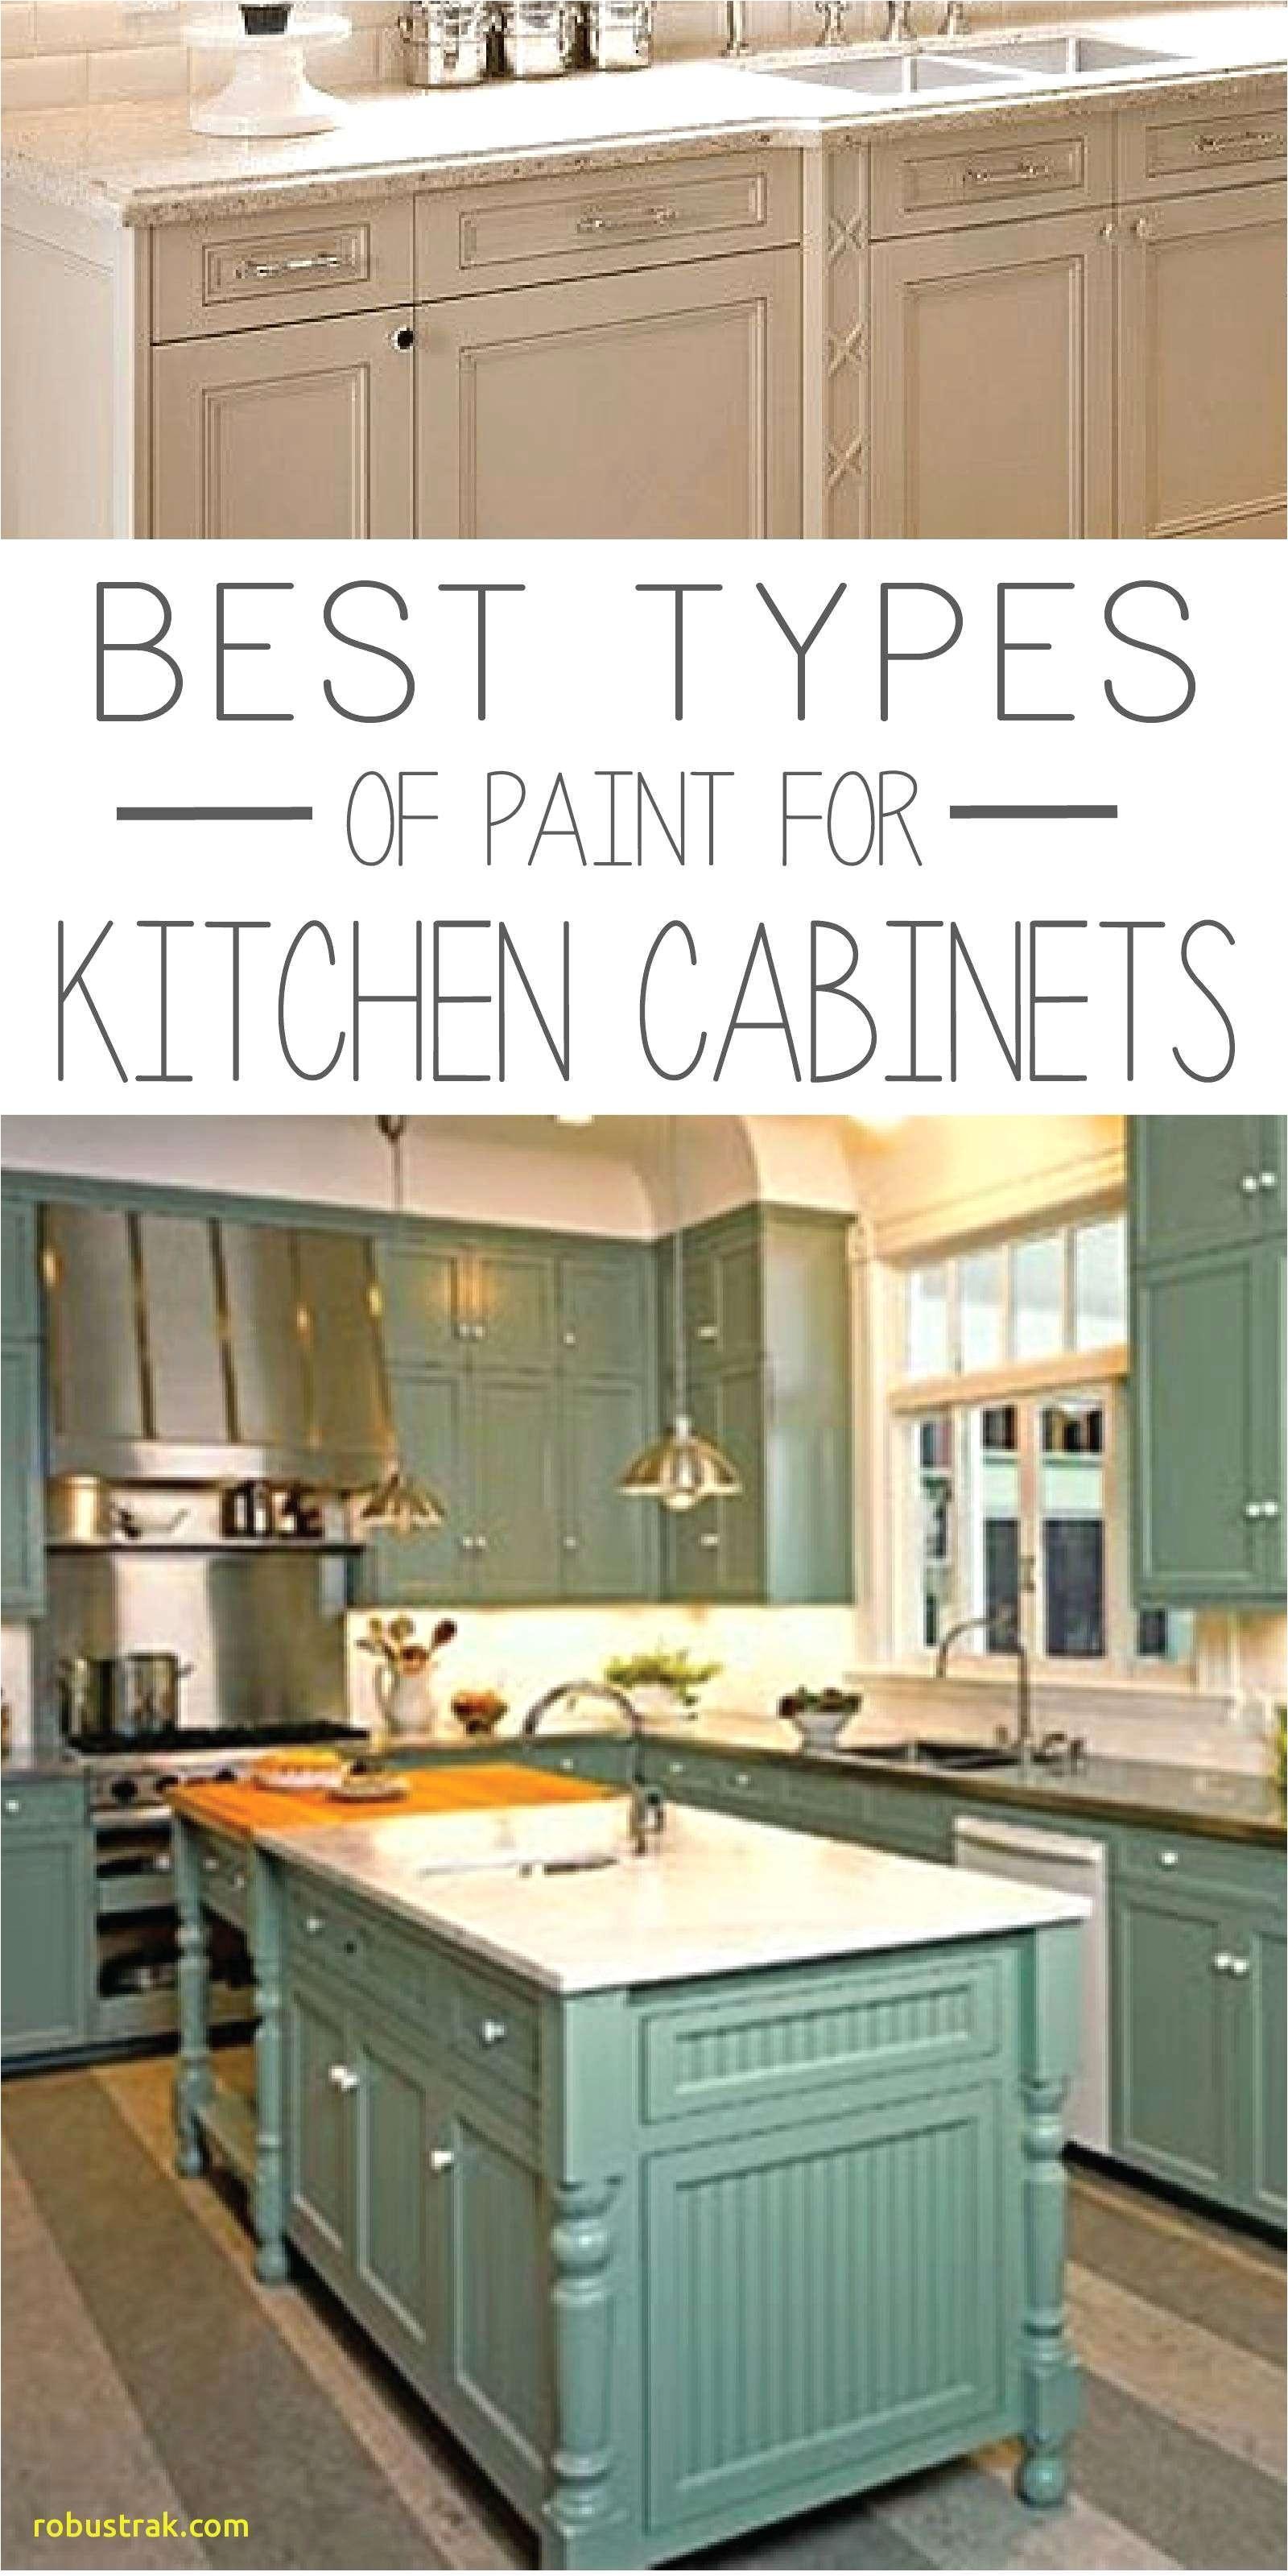 Mesmerizing Kitchen Wall Paint Ideas In Kitchen Paint Color Ideas Fresh Kitchen Joys Kitchen Joys Kitchen 0d